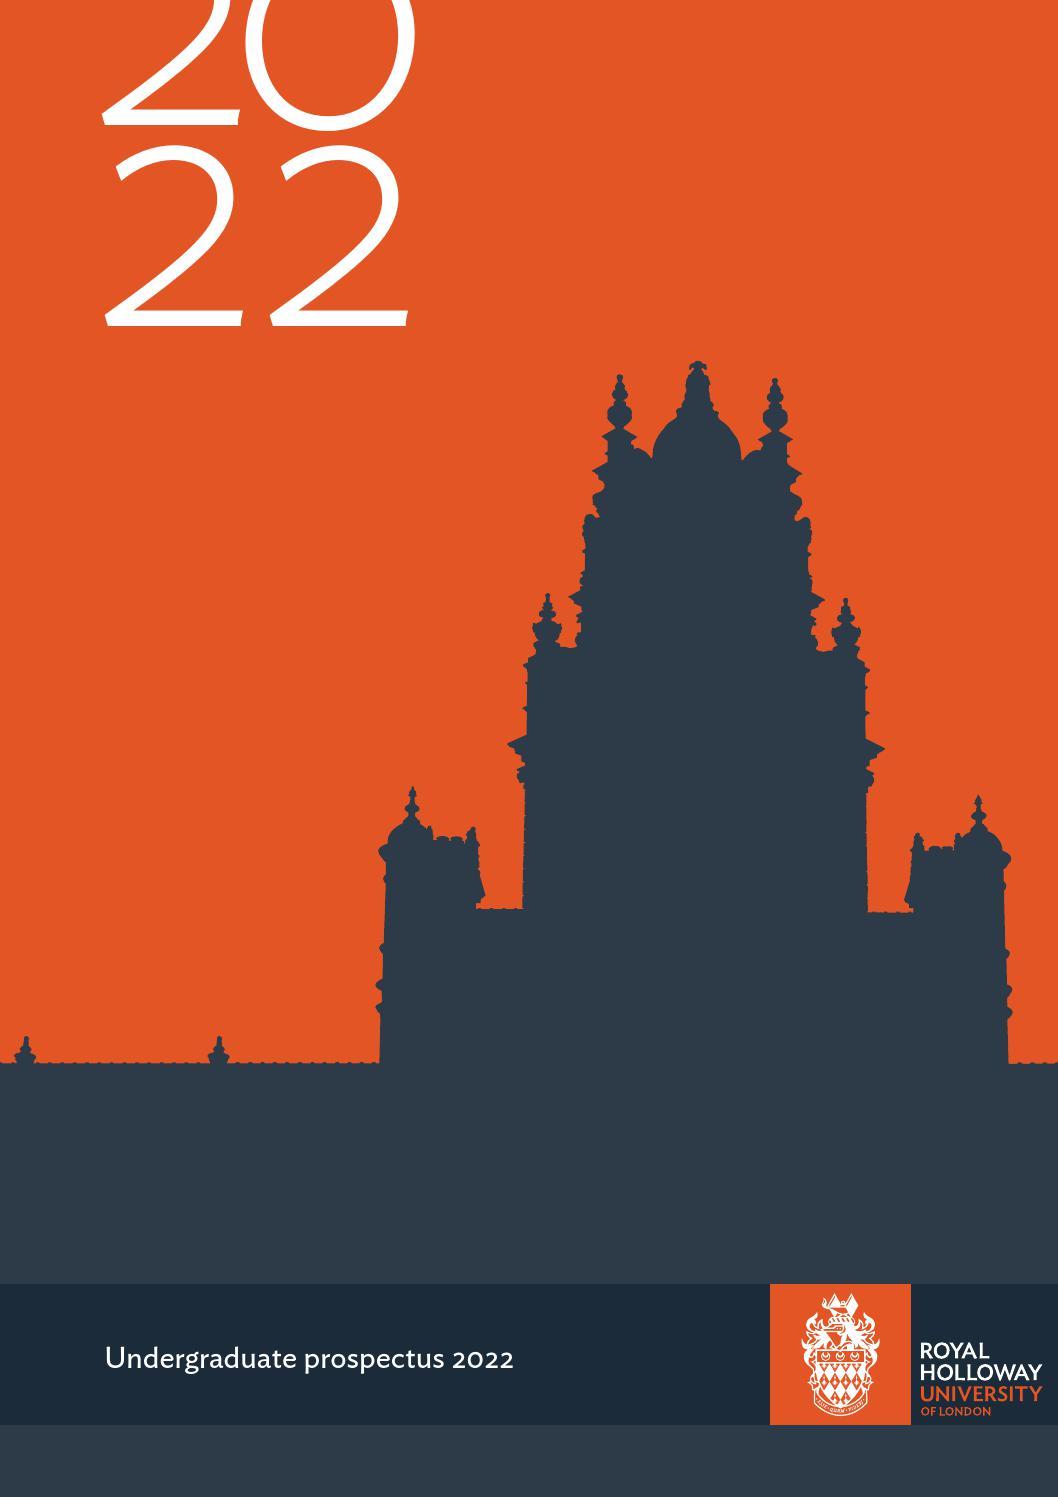 Pwcs Calendar 2022 23.Undergraduate Prospectus 2022 By Royal Holloway University Of London Issuu